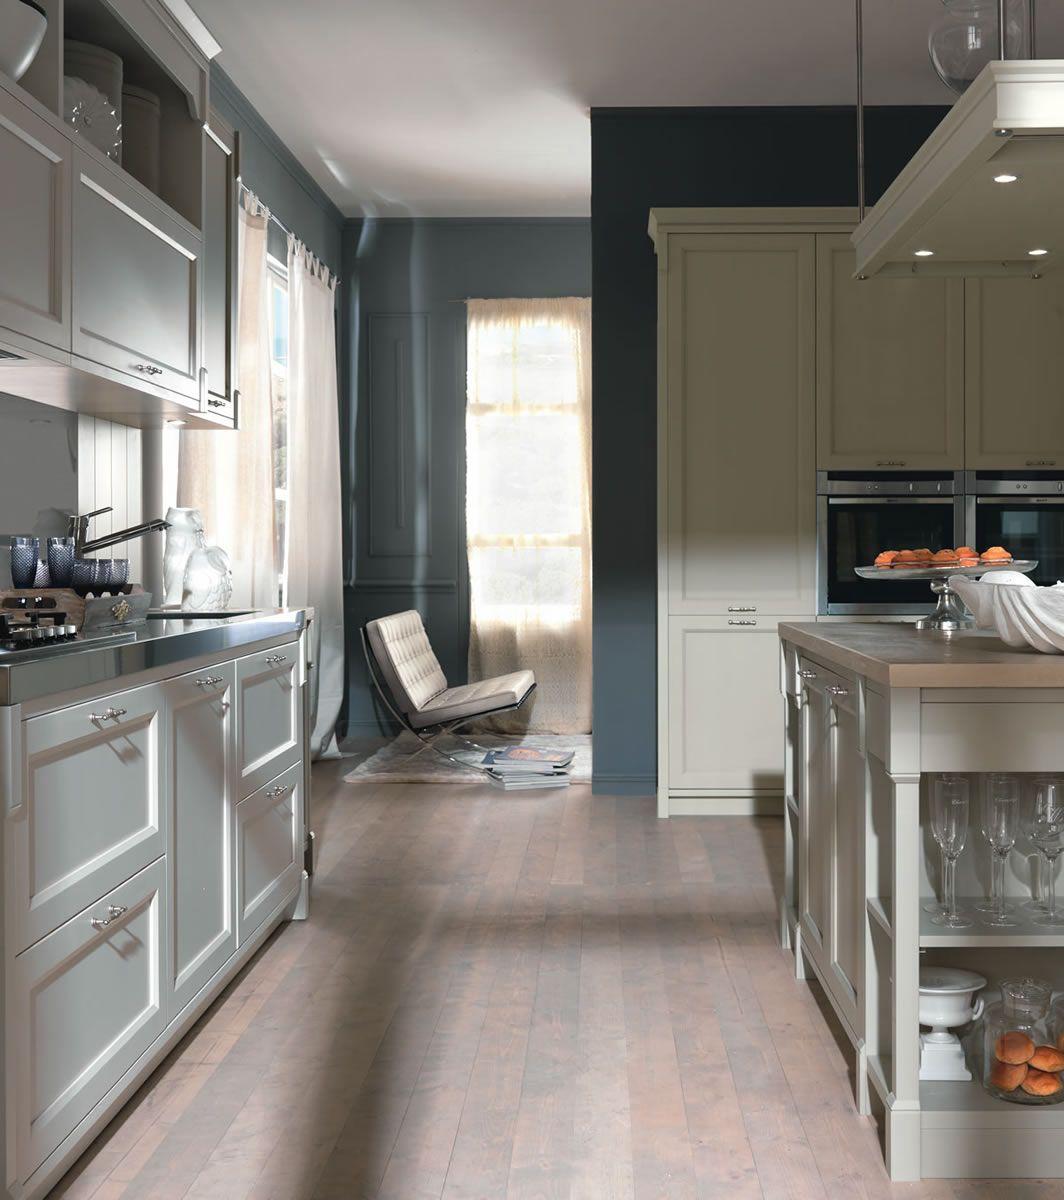 cucine shabby chic cucina classica new style cucine classiche in ... - Cucine Poggibonsi